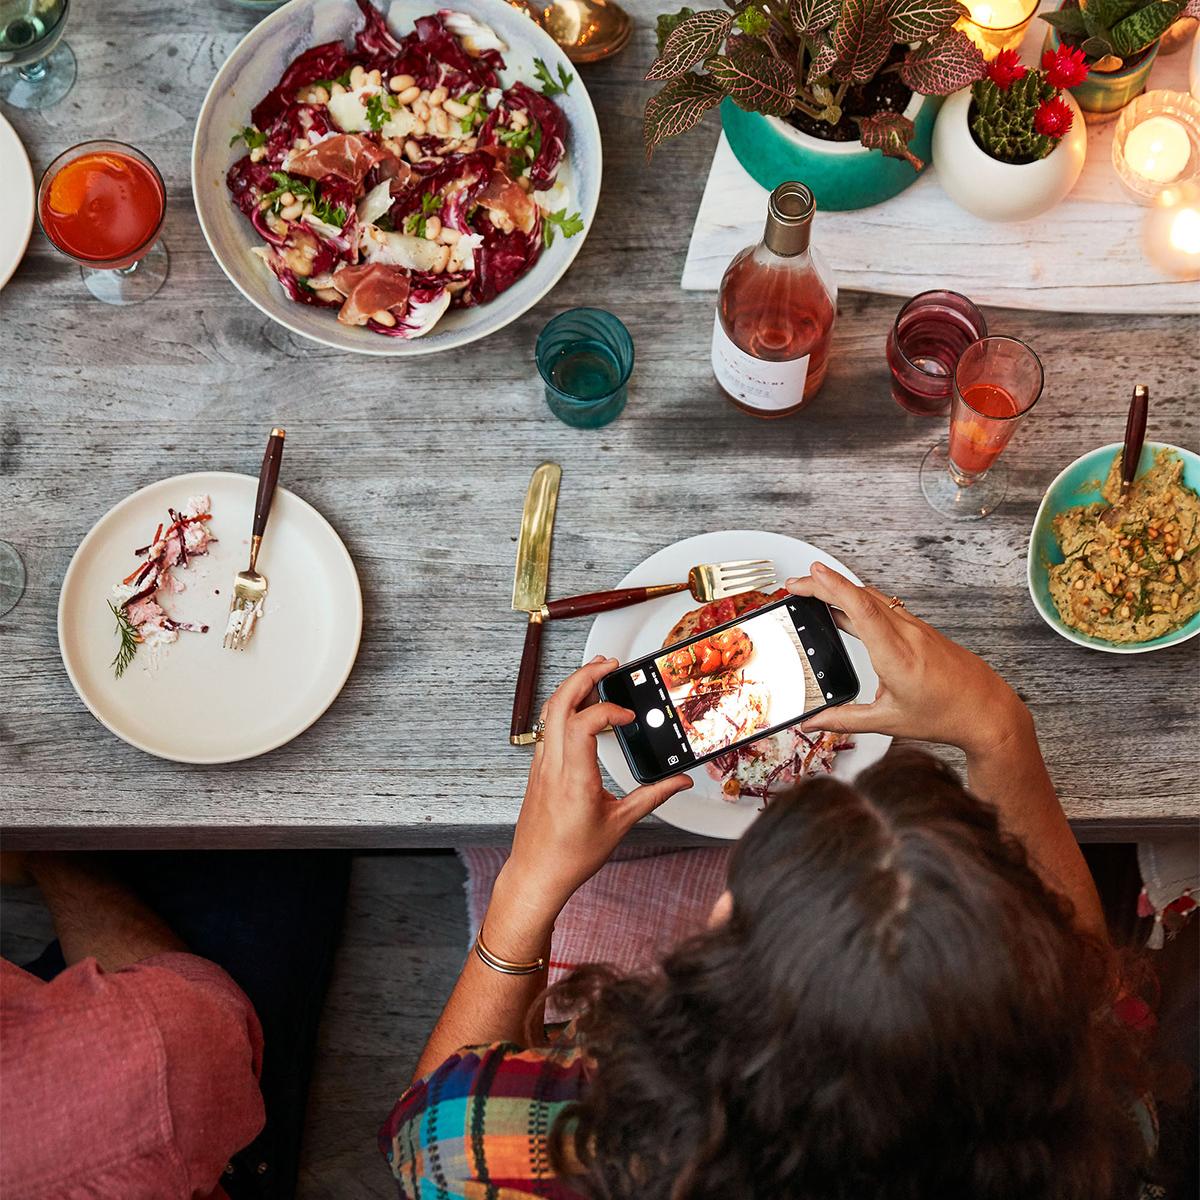 phone social media photo summer dinner party